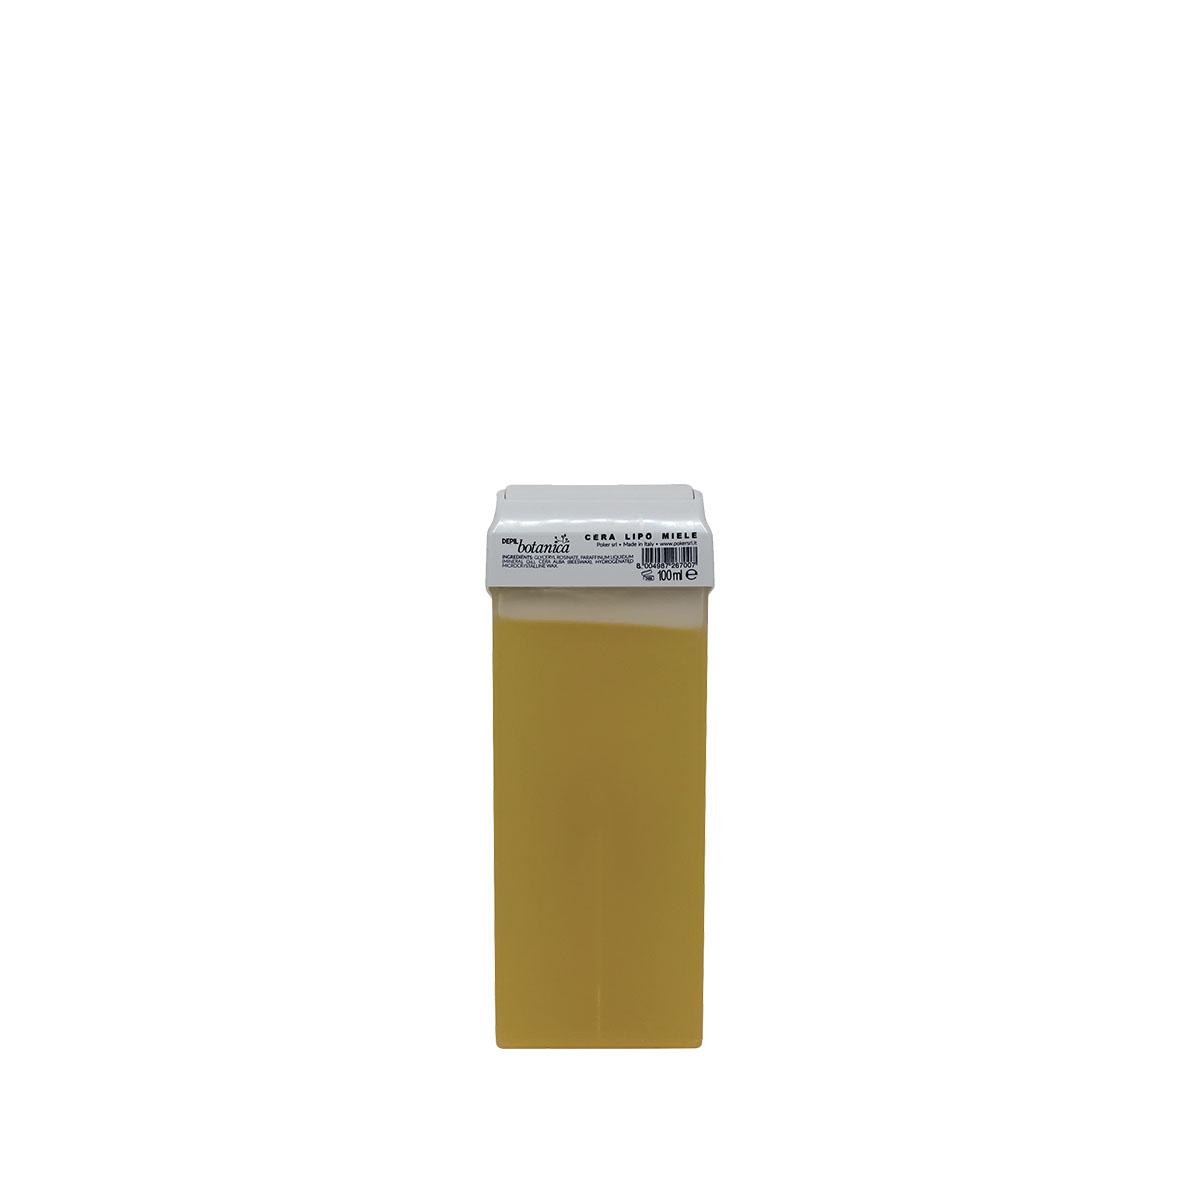 Cere Depil-botanica 100ml Miele